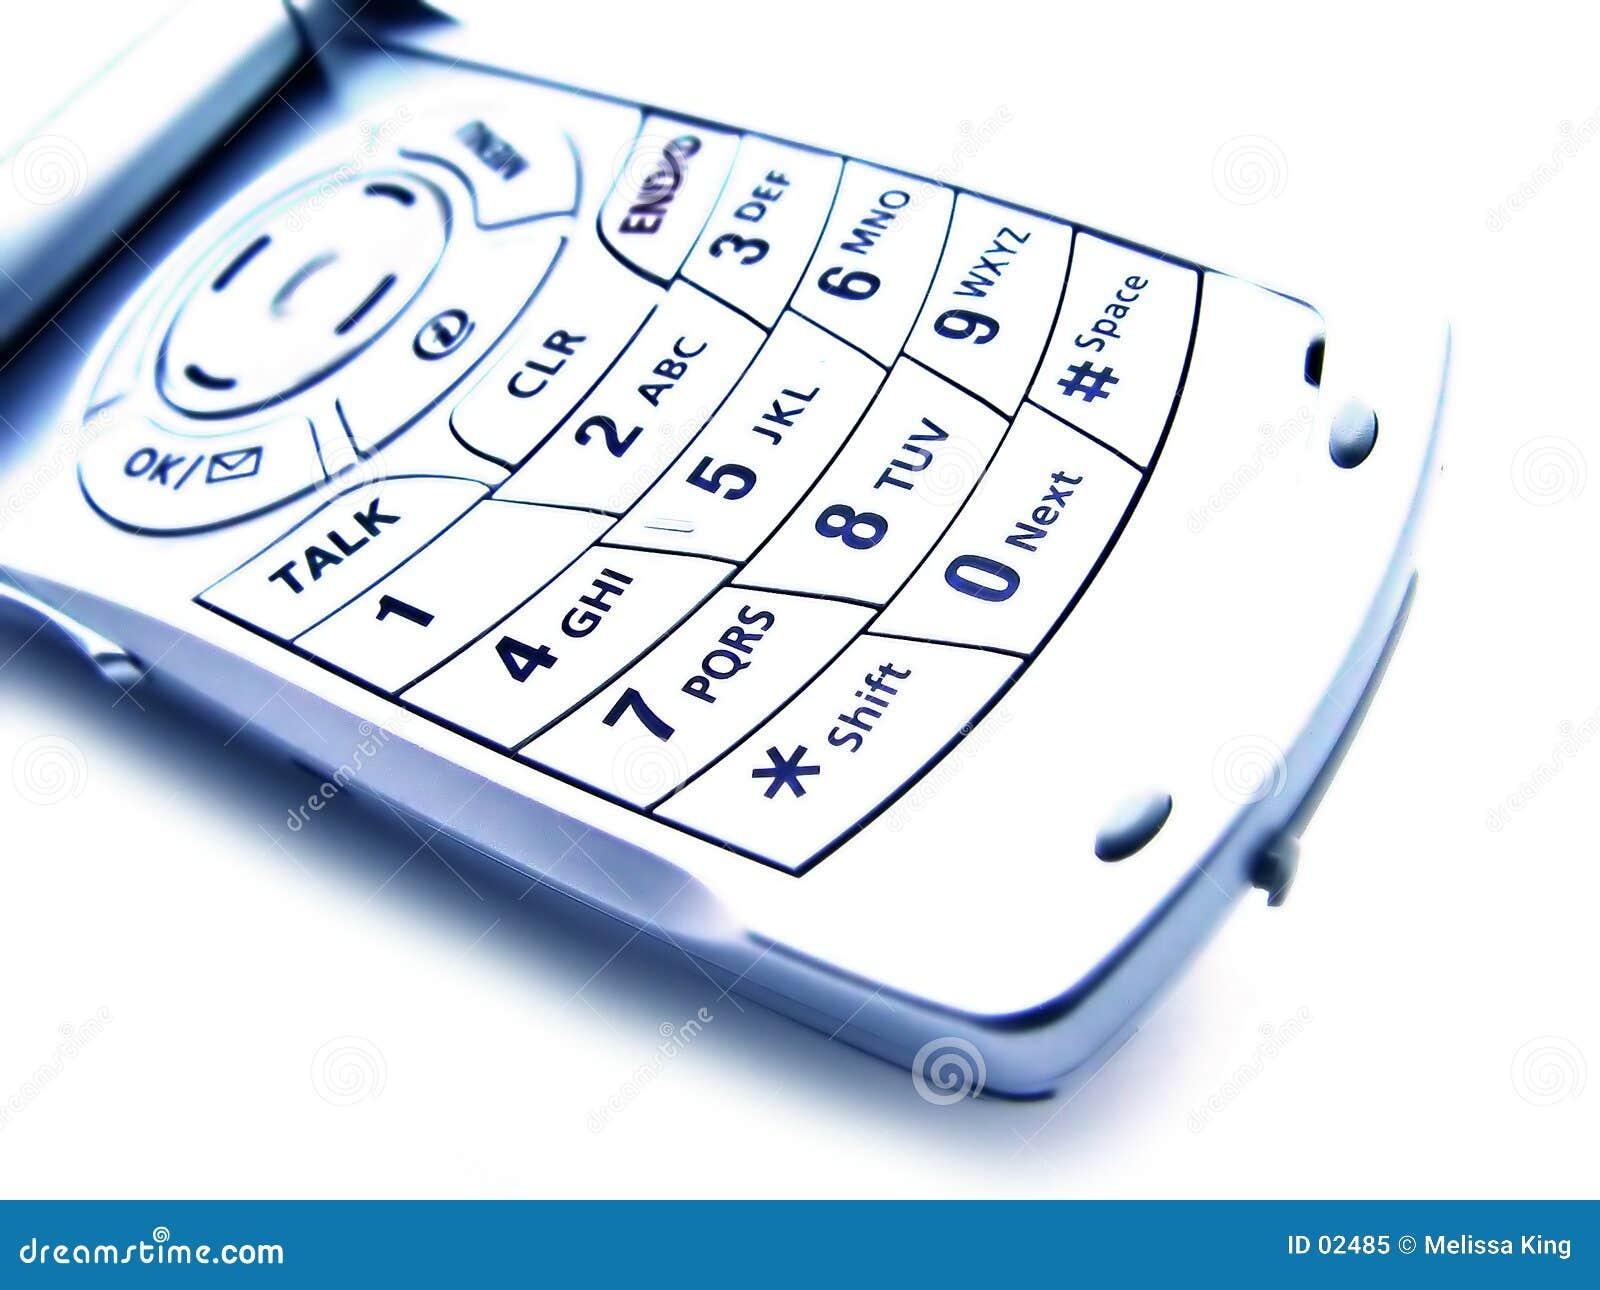 Abstraktes Mobiltelefon - getrennt